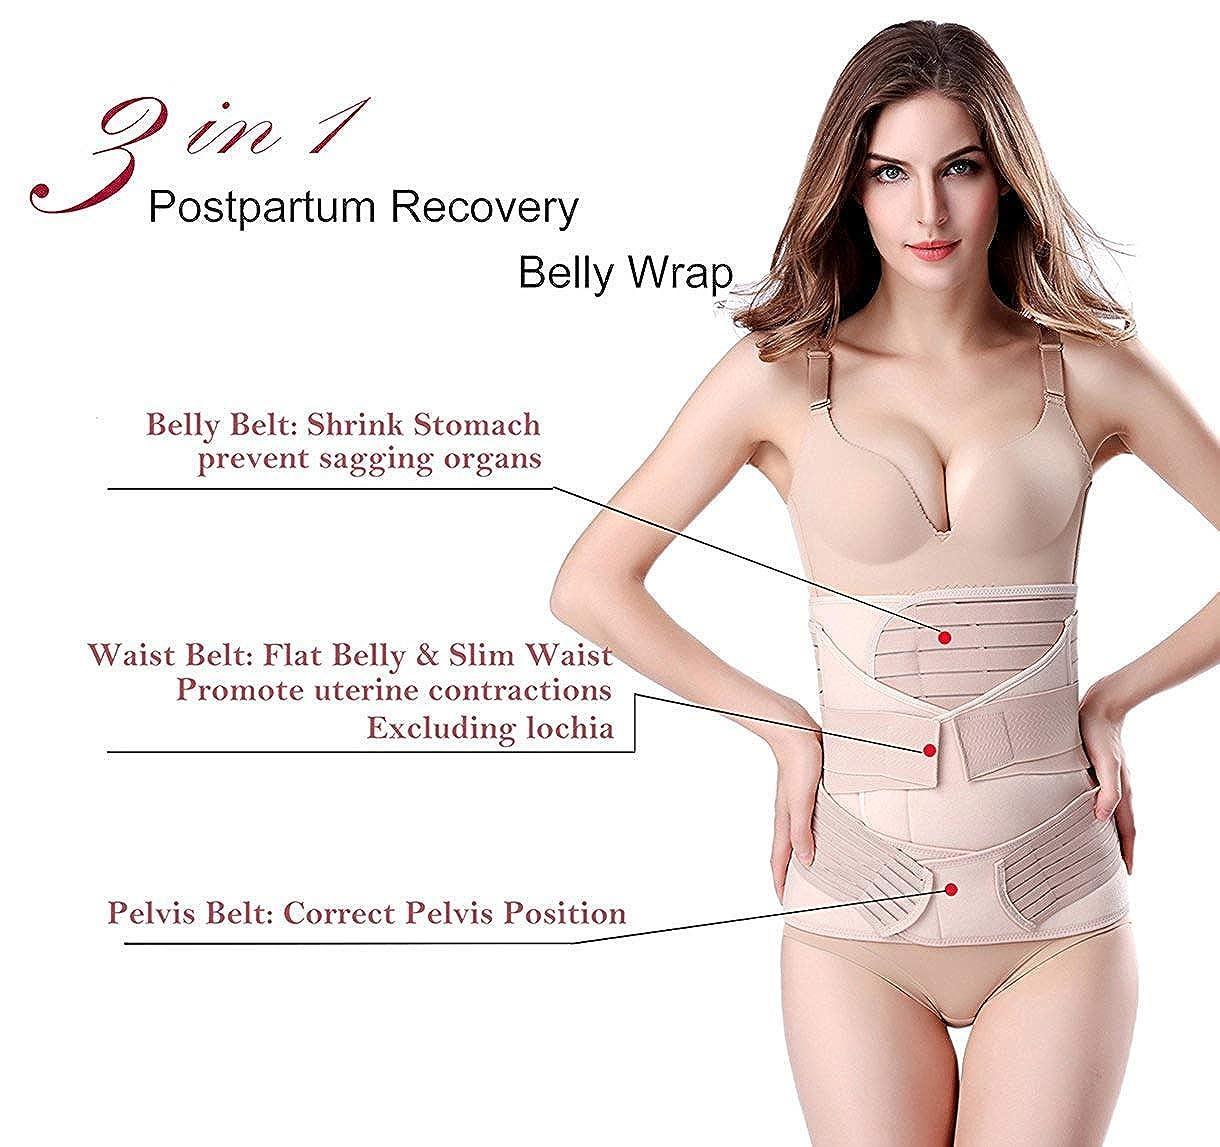 Chongerfei 3/en 1/Postpartum Support Recuperaci/ón Vientre Wrap Cintura//Pelvis Cintur/ón Body Shaper Shapewear posnatal